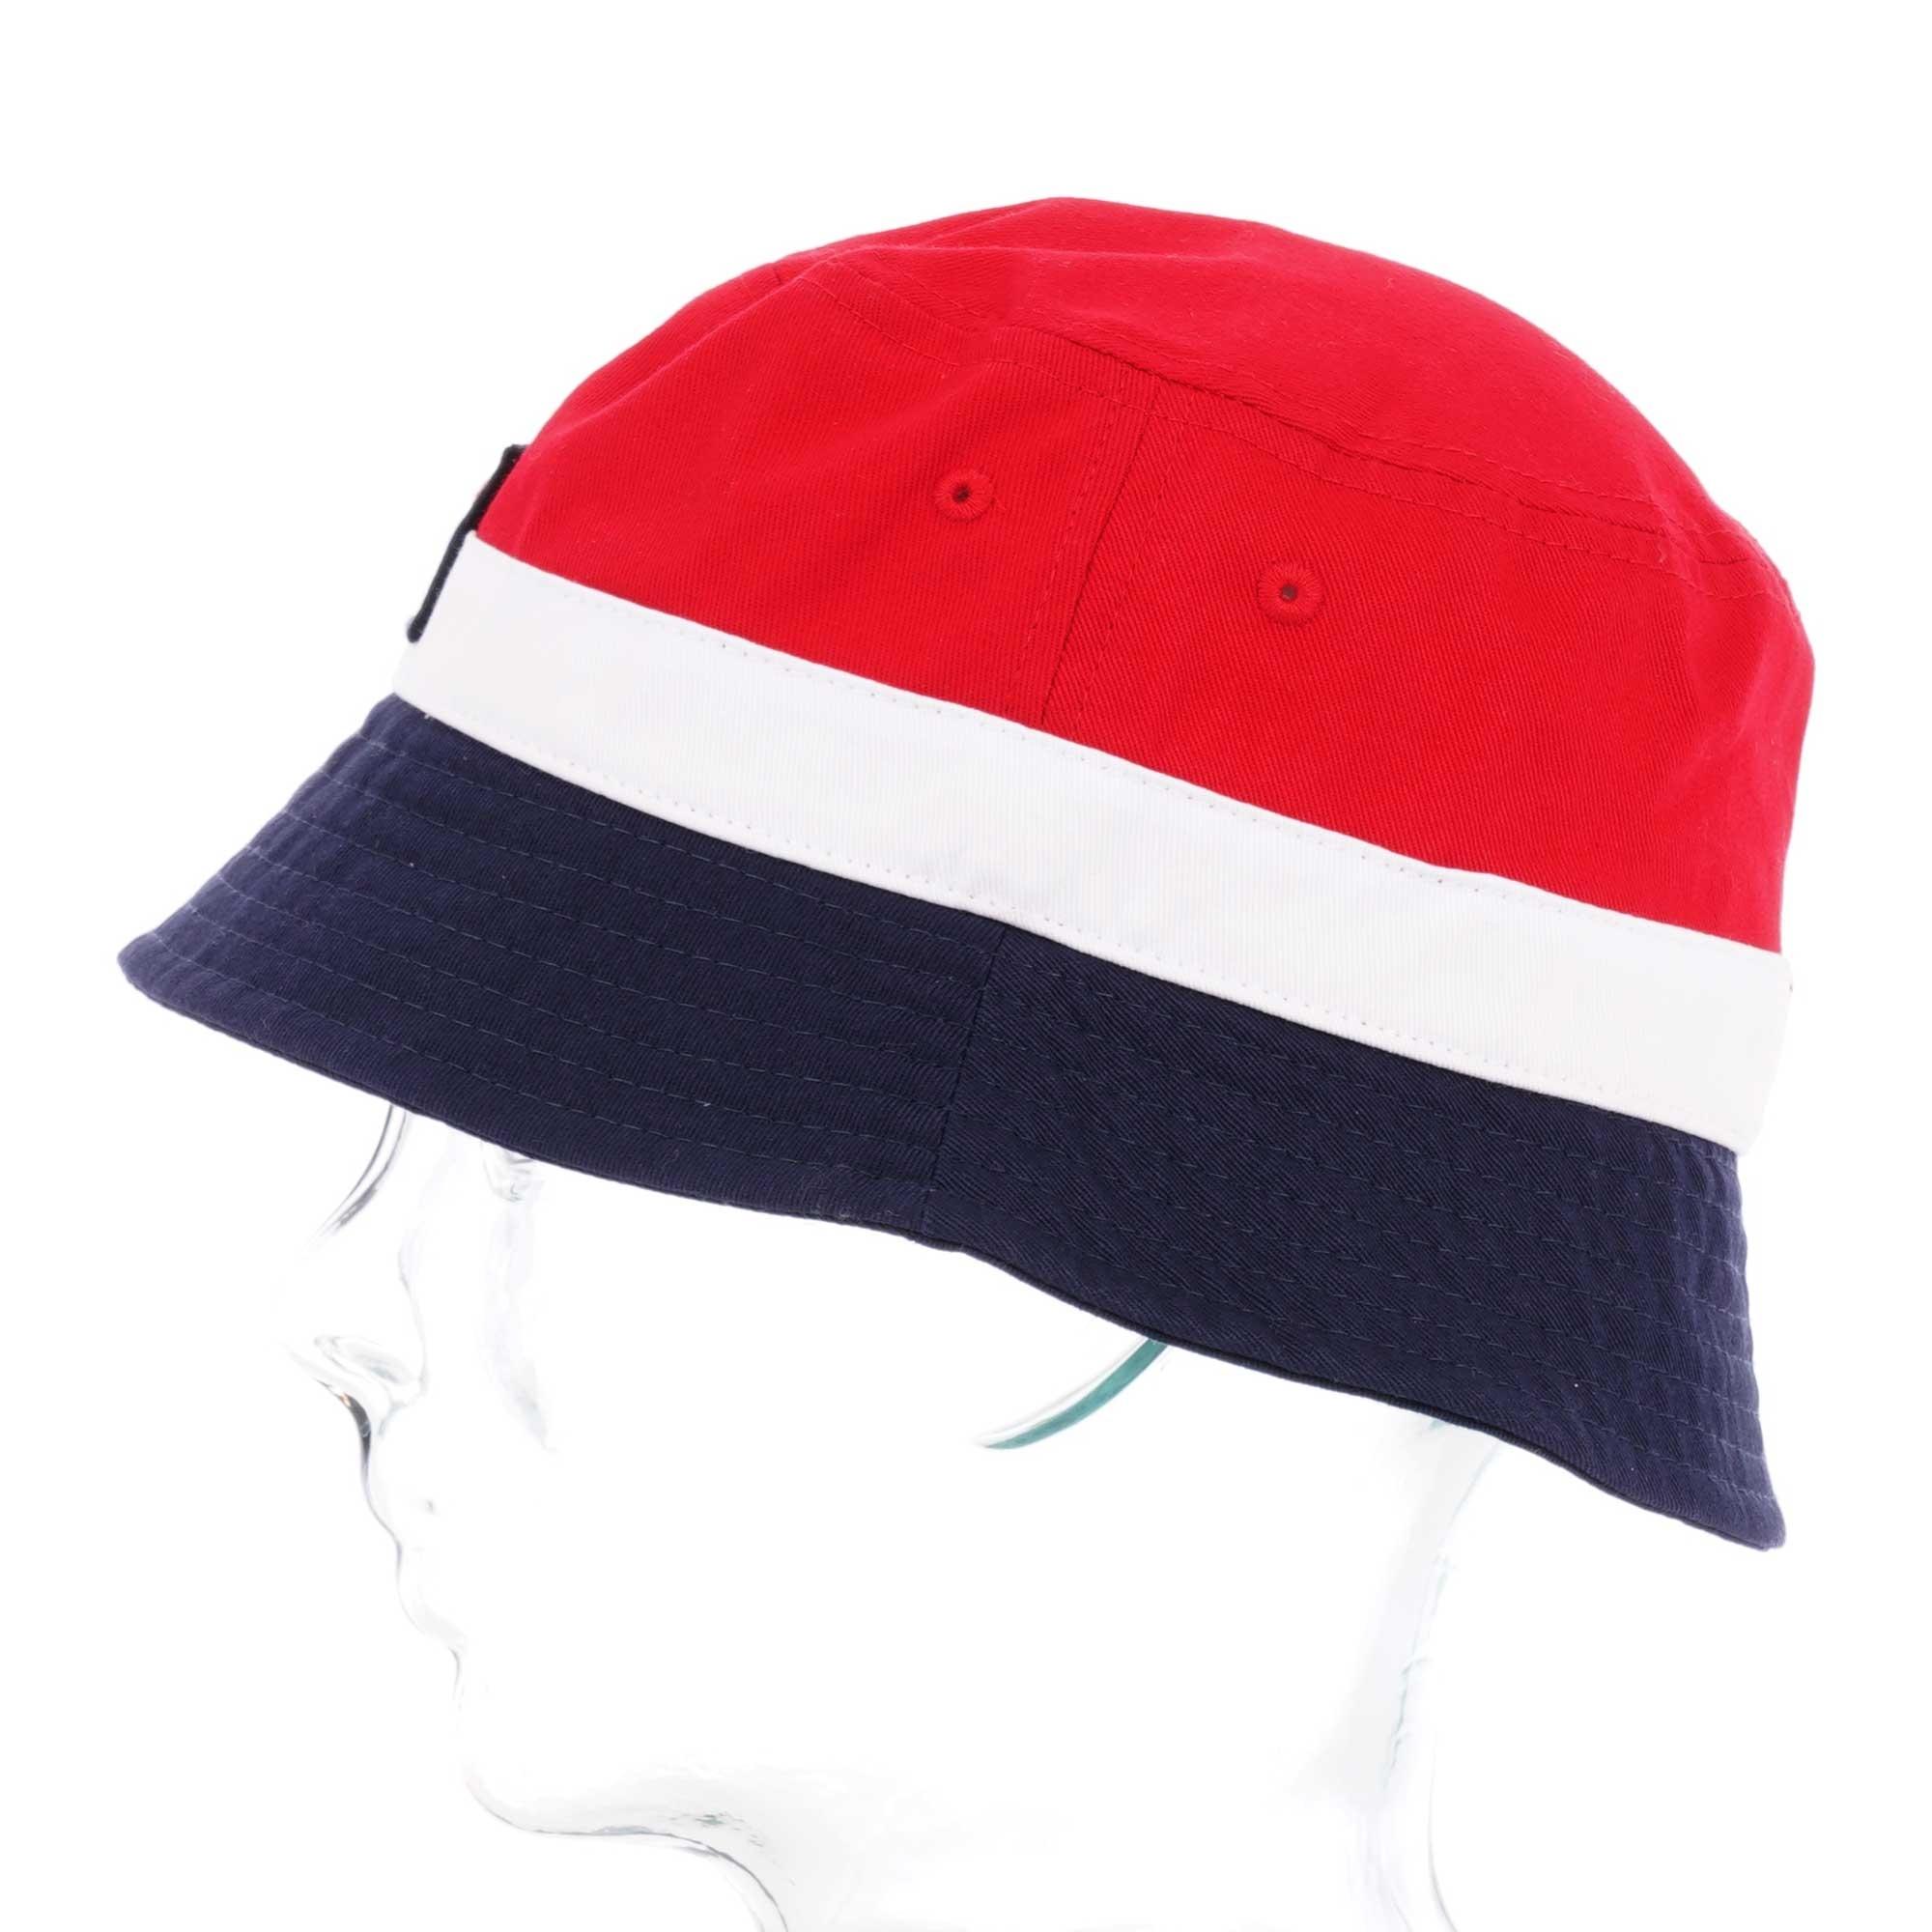 Fila Vintage Basil Bucket Hat Chinese Red Peacoat White Xs19wht405